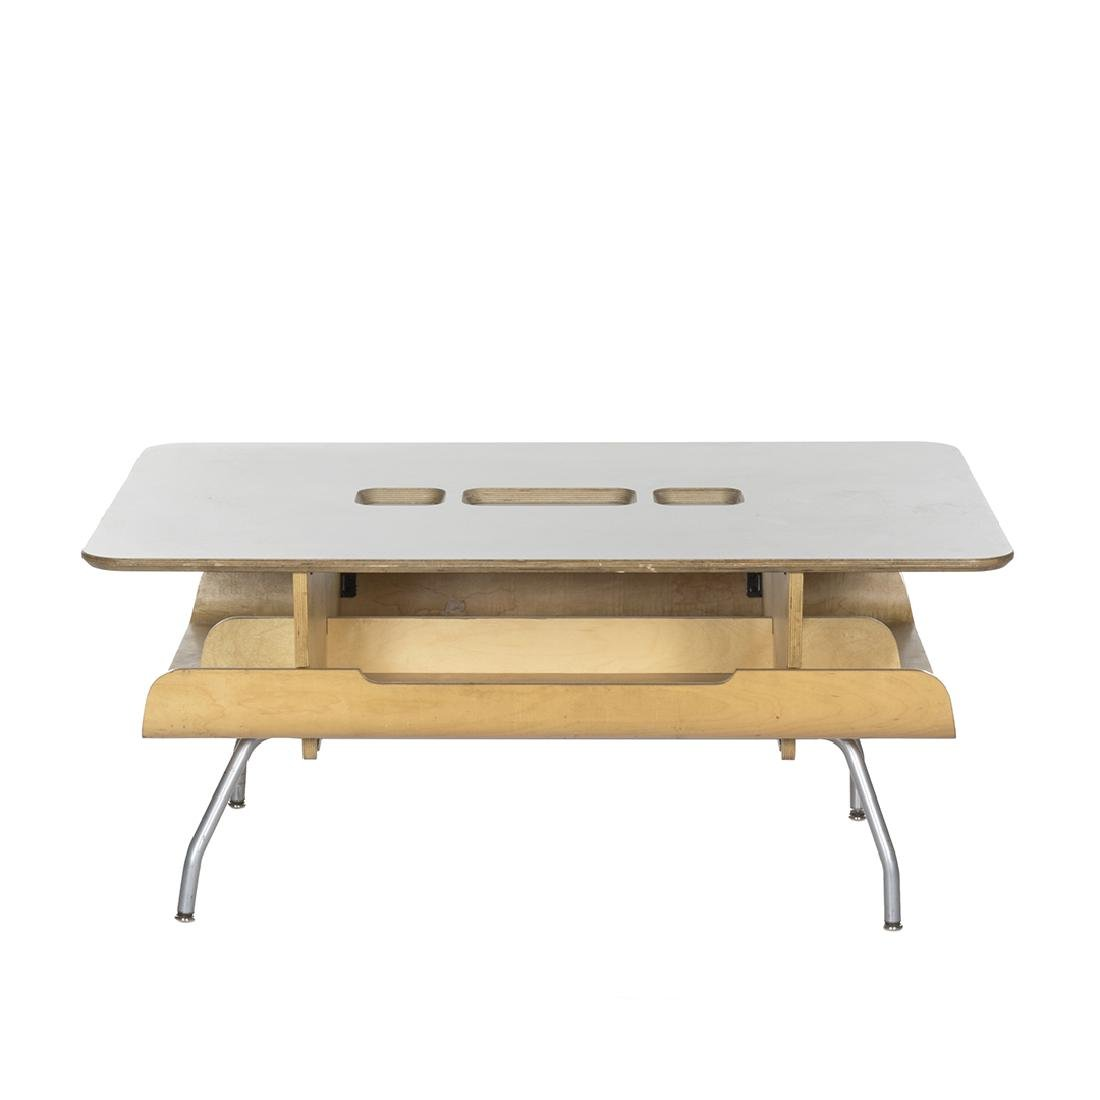 Herman Miller Child's Work Table